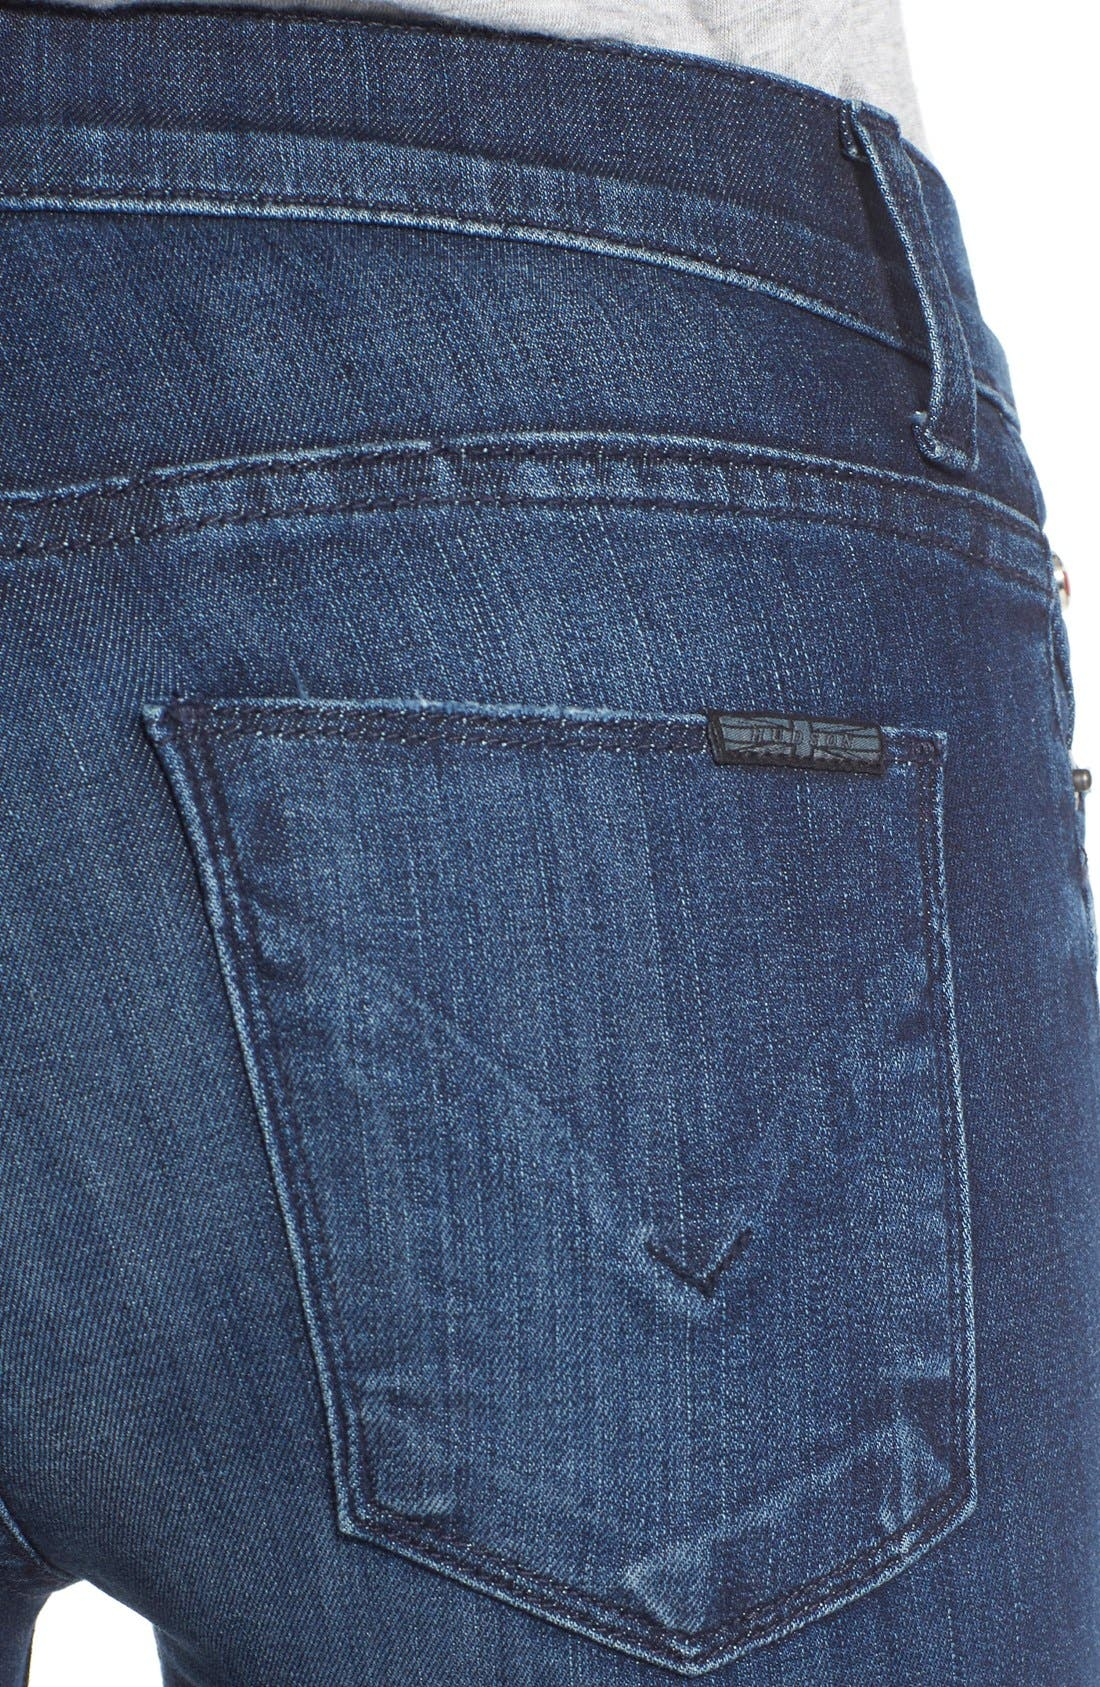 'Nico' Super Skinny Jeans,                             Alternate thumbnail 14, color,